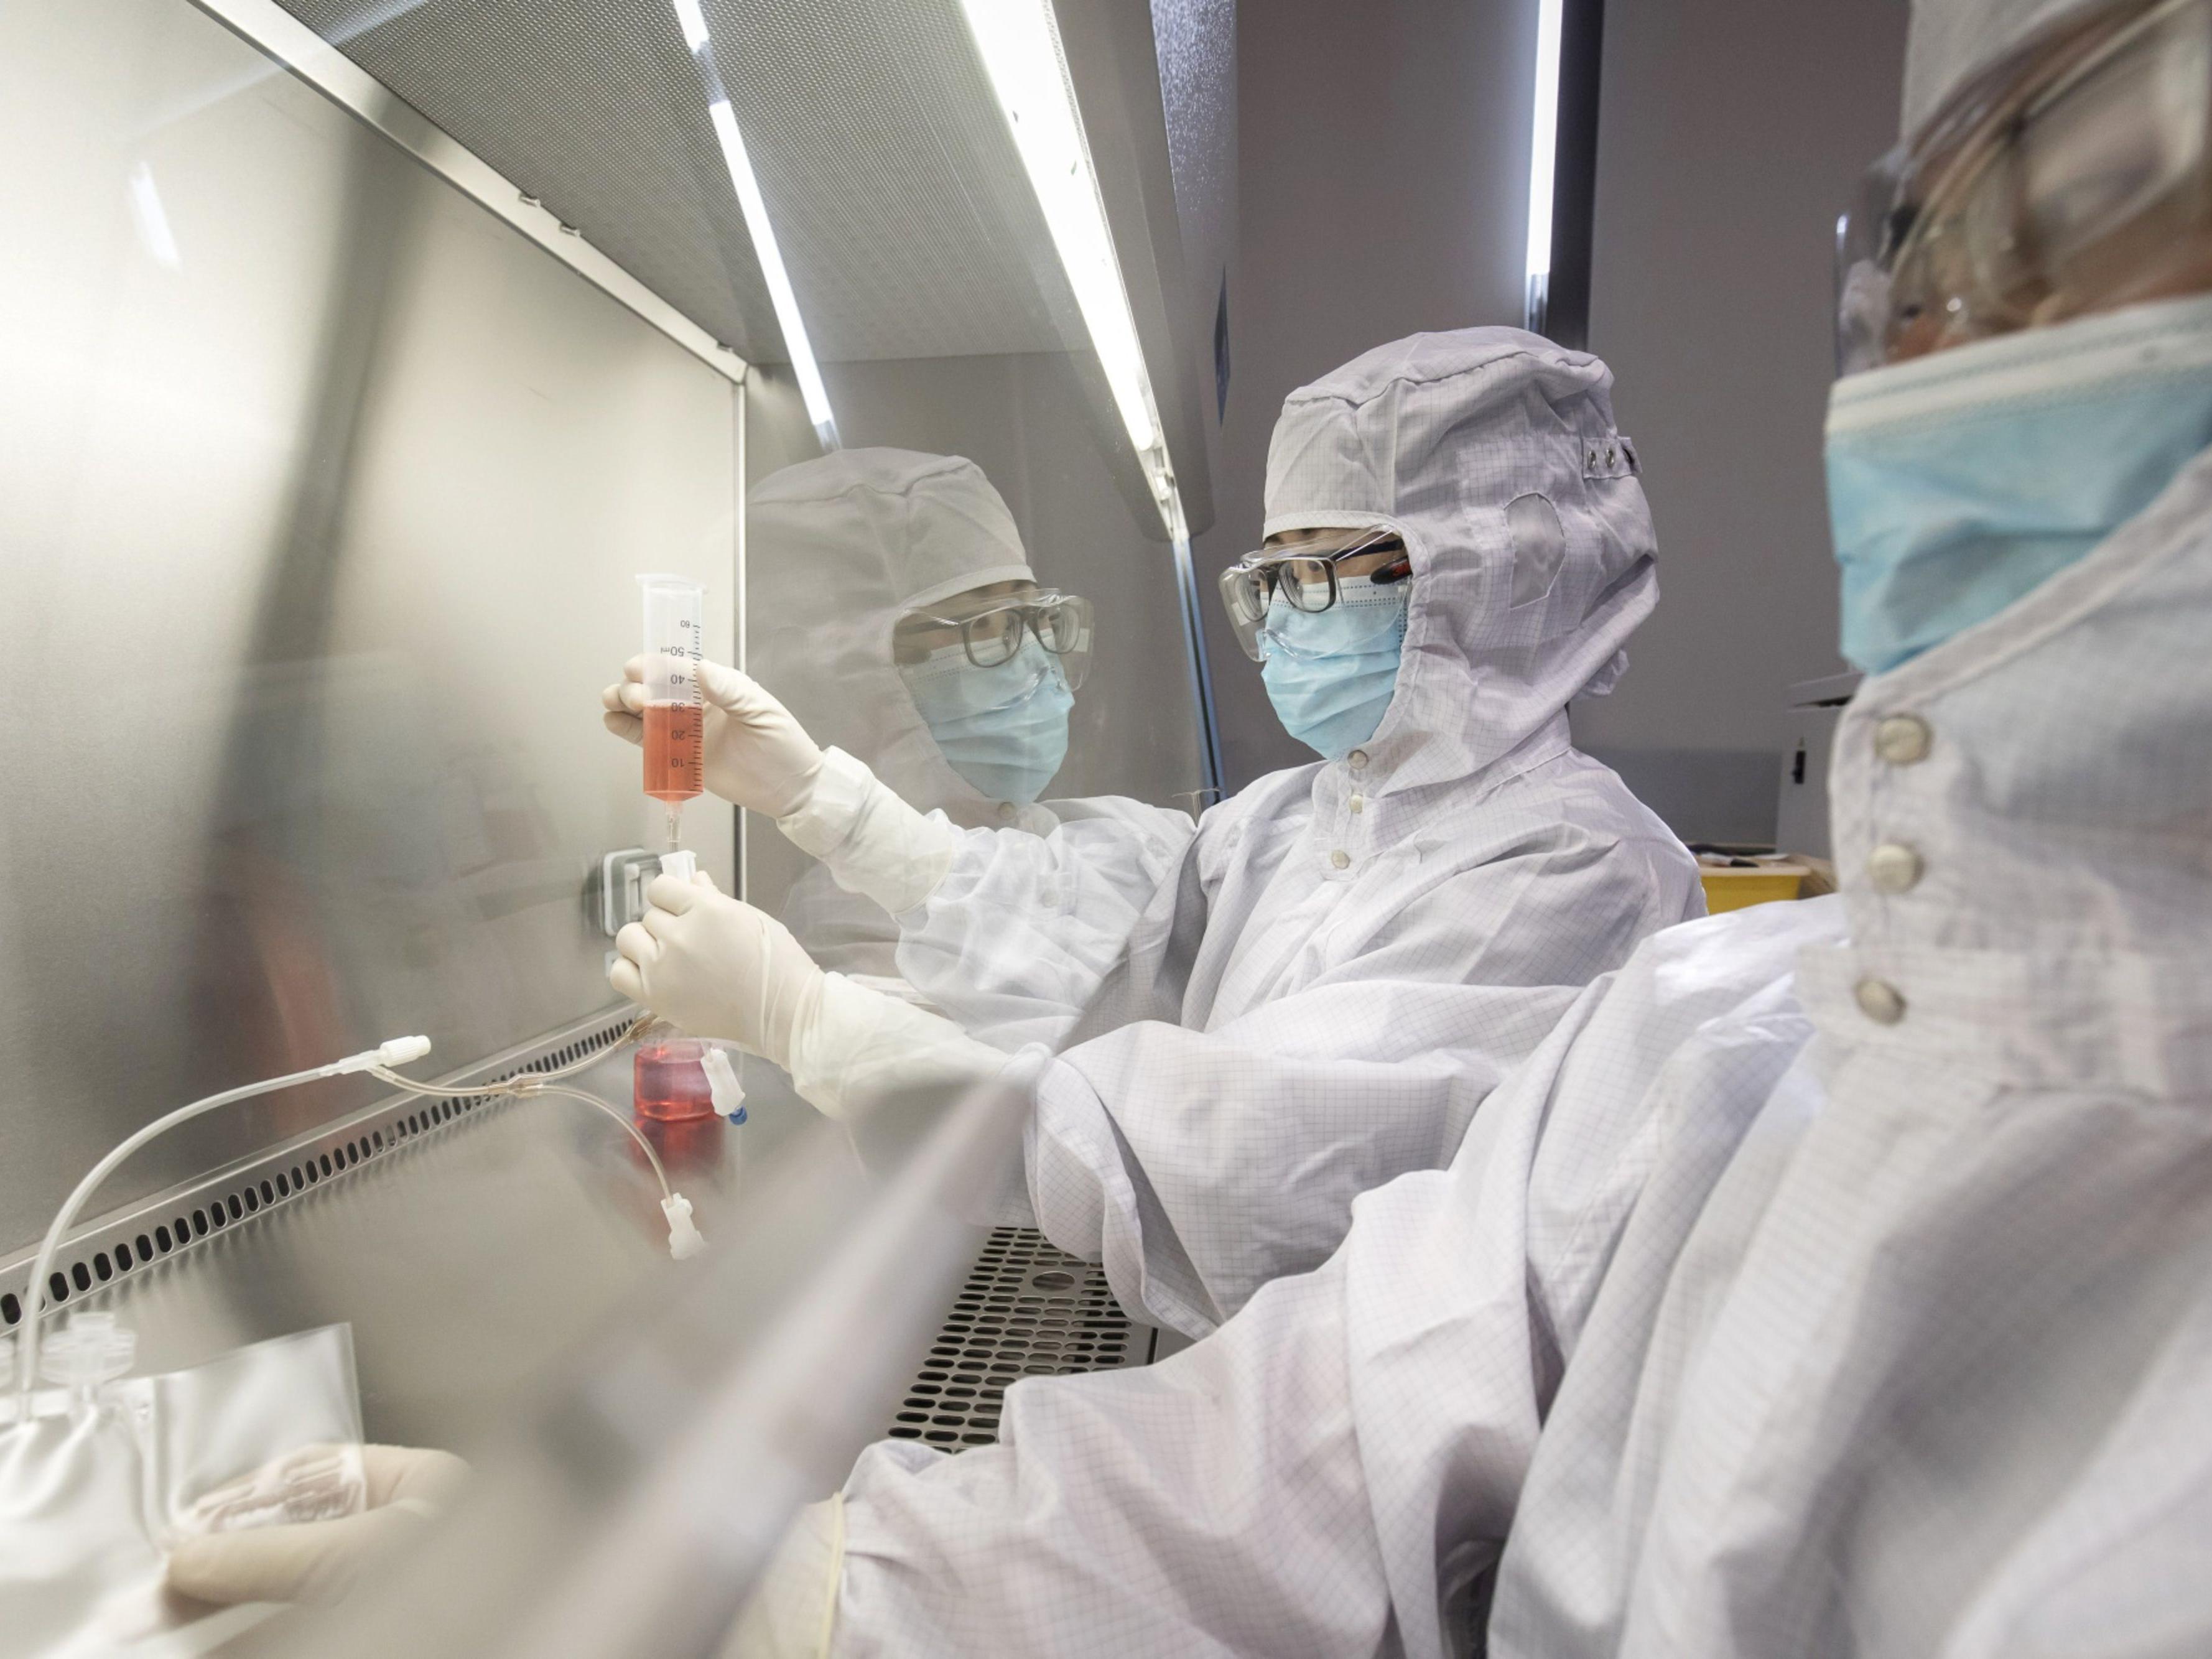 The Impact of the Coronavirus on Global Supply Chains